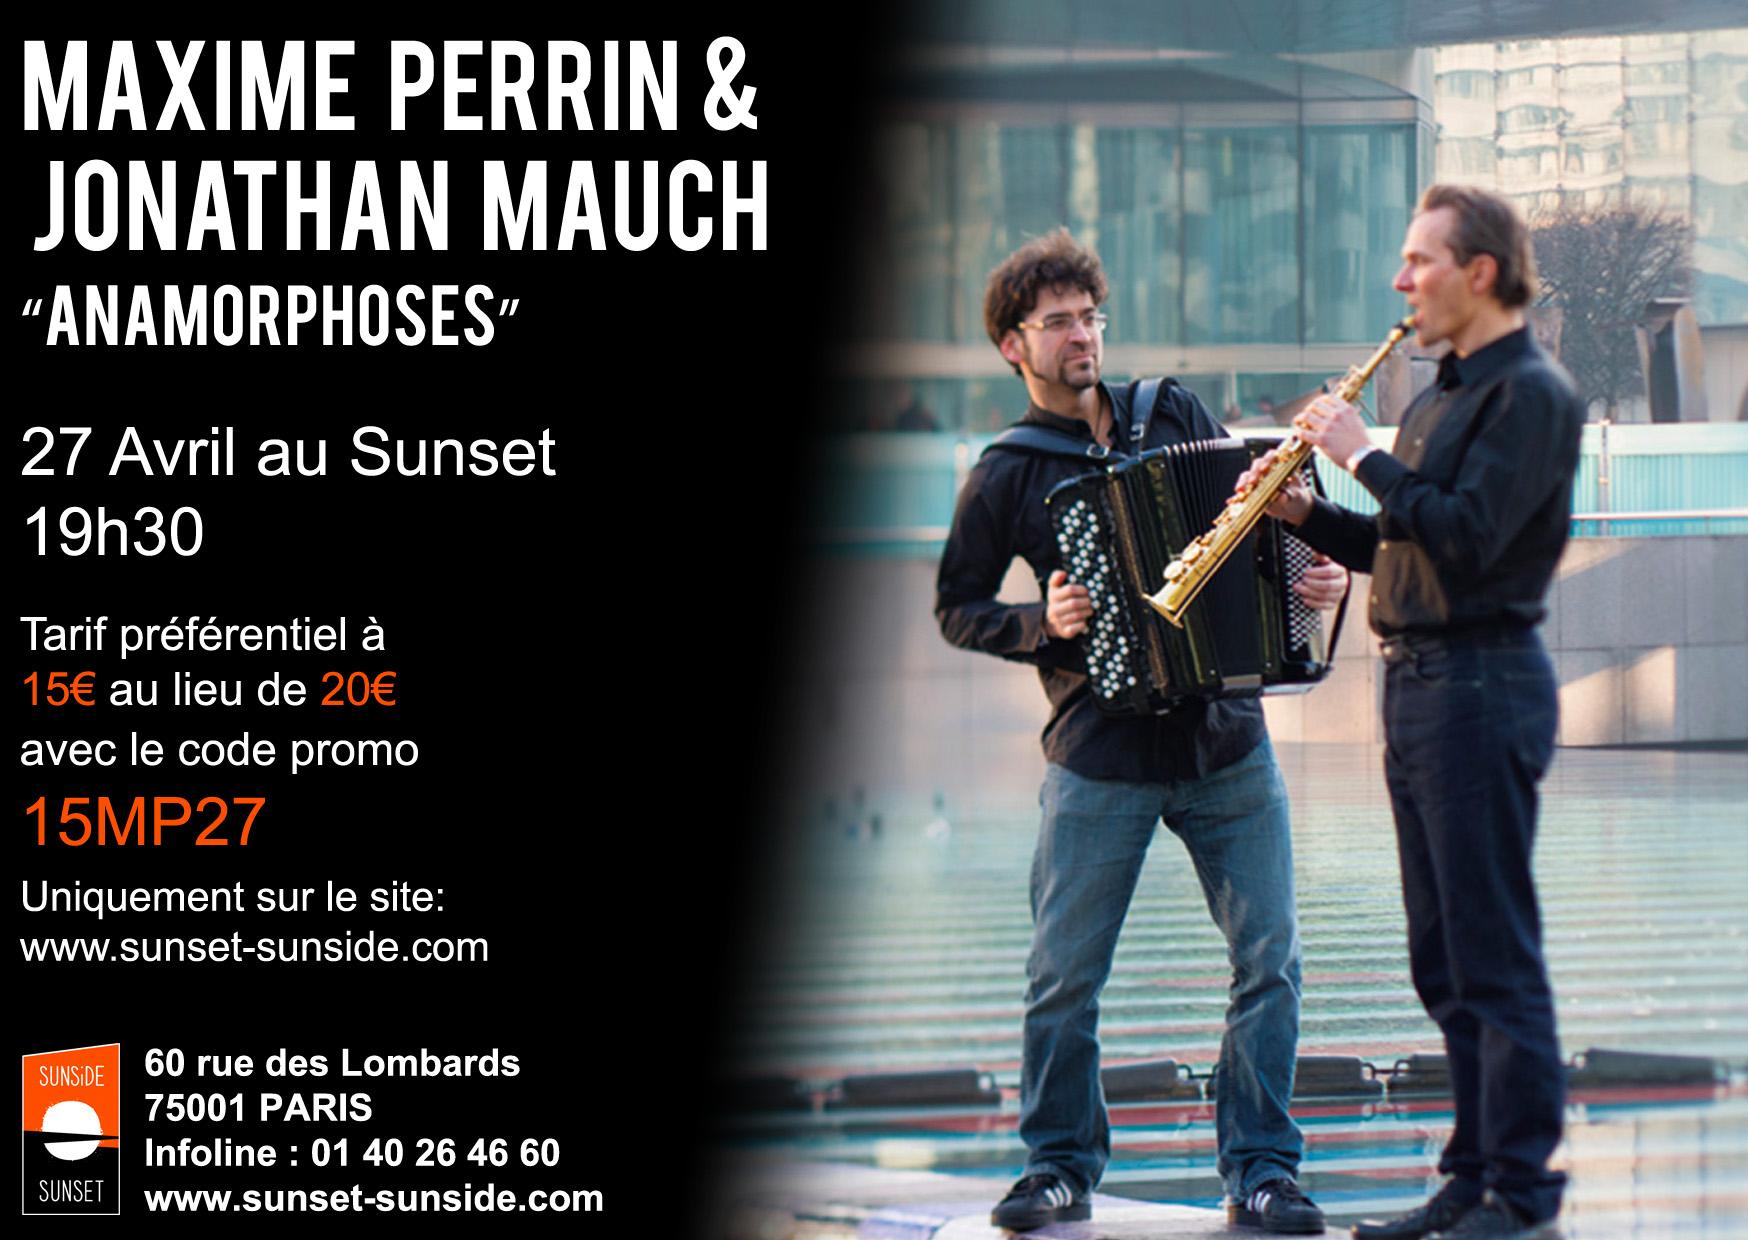 Affiche du concert d'Anamorphoses : Maxime Perrin et Jonathan Mauch